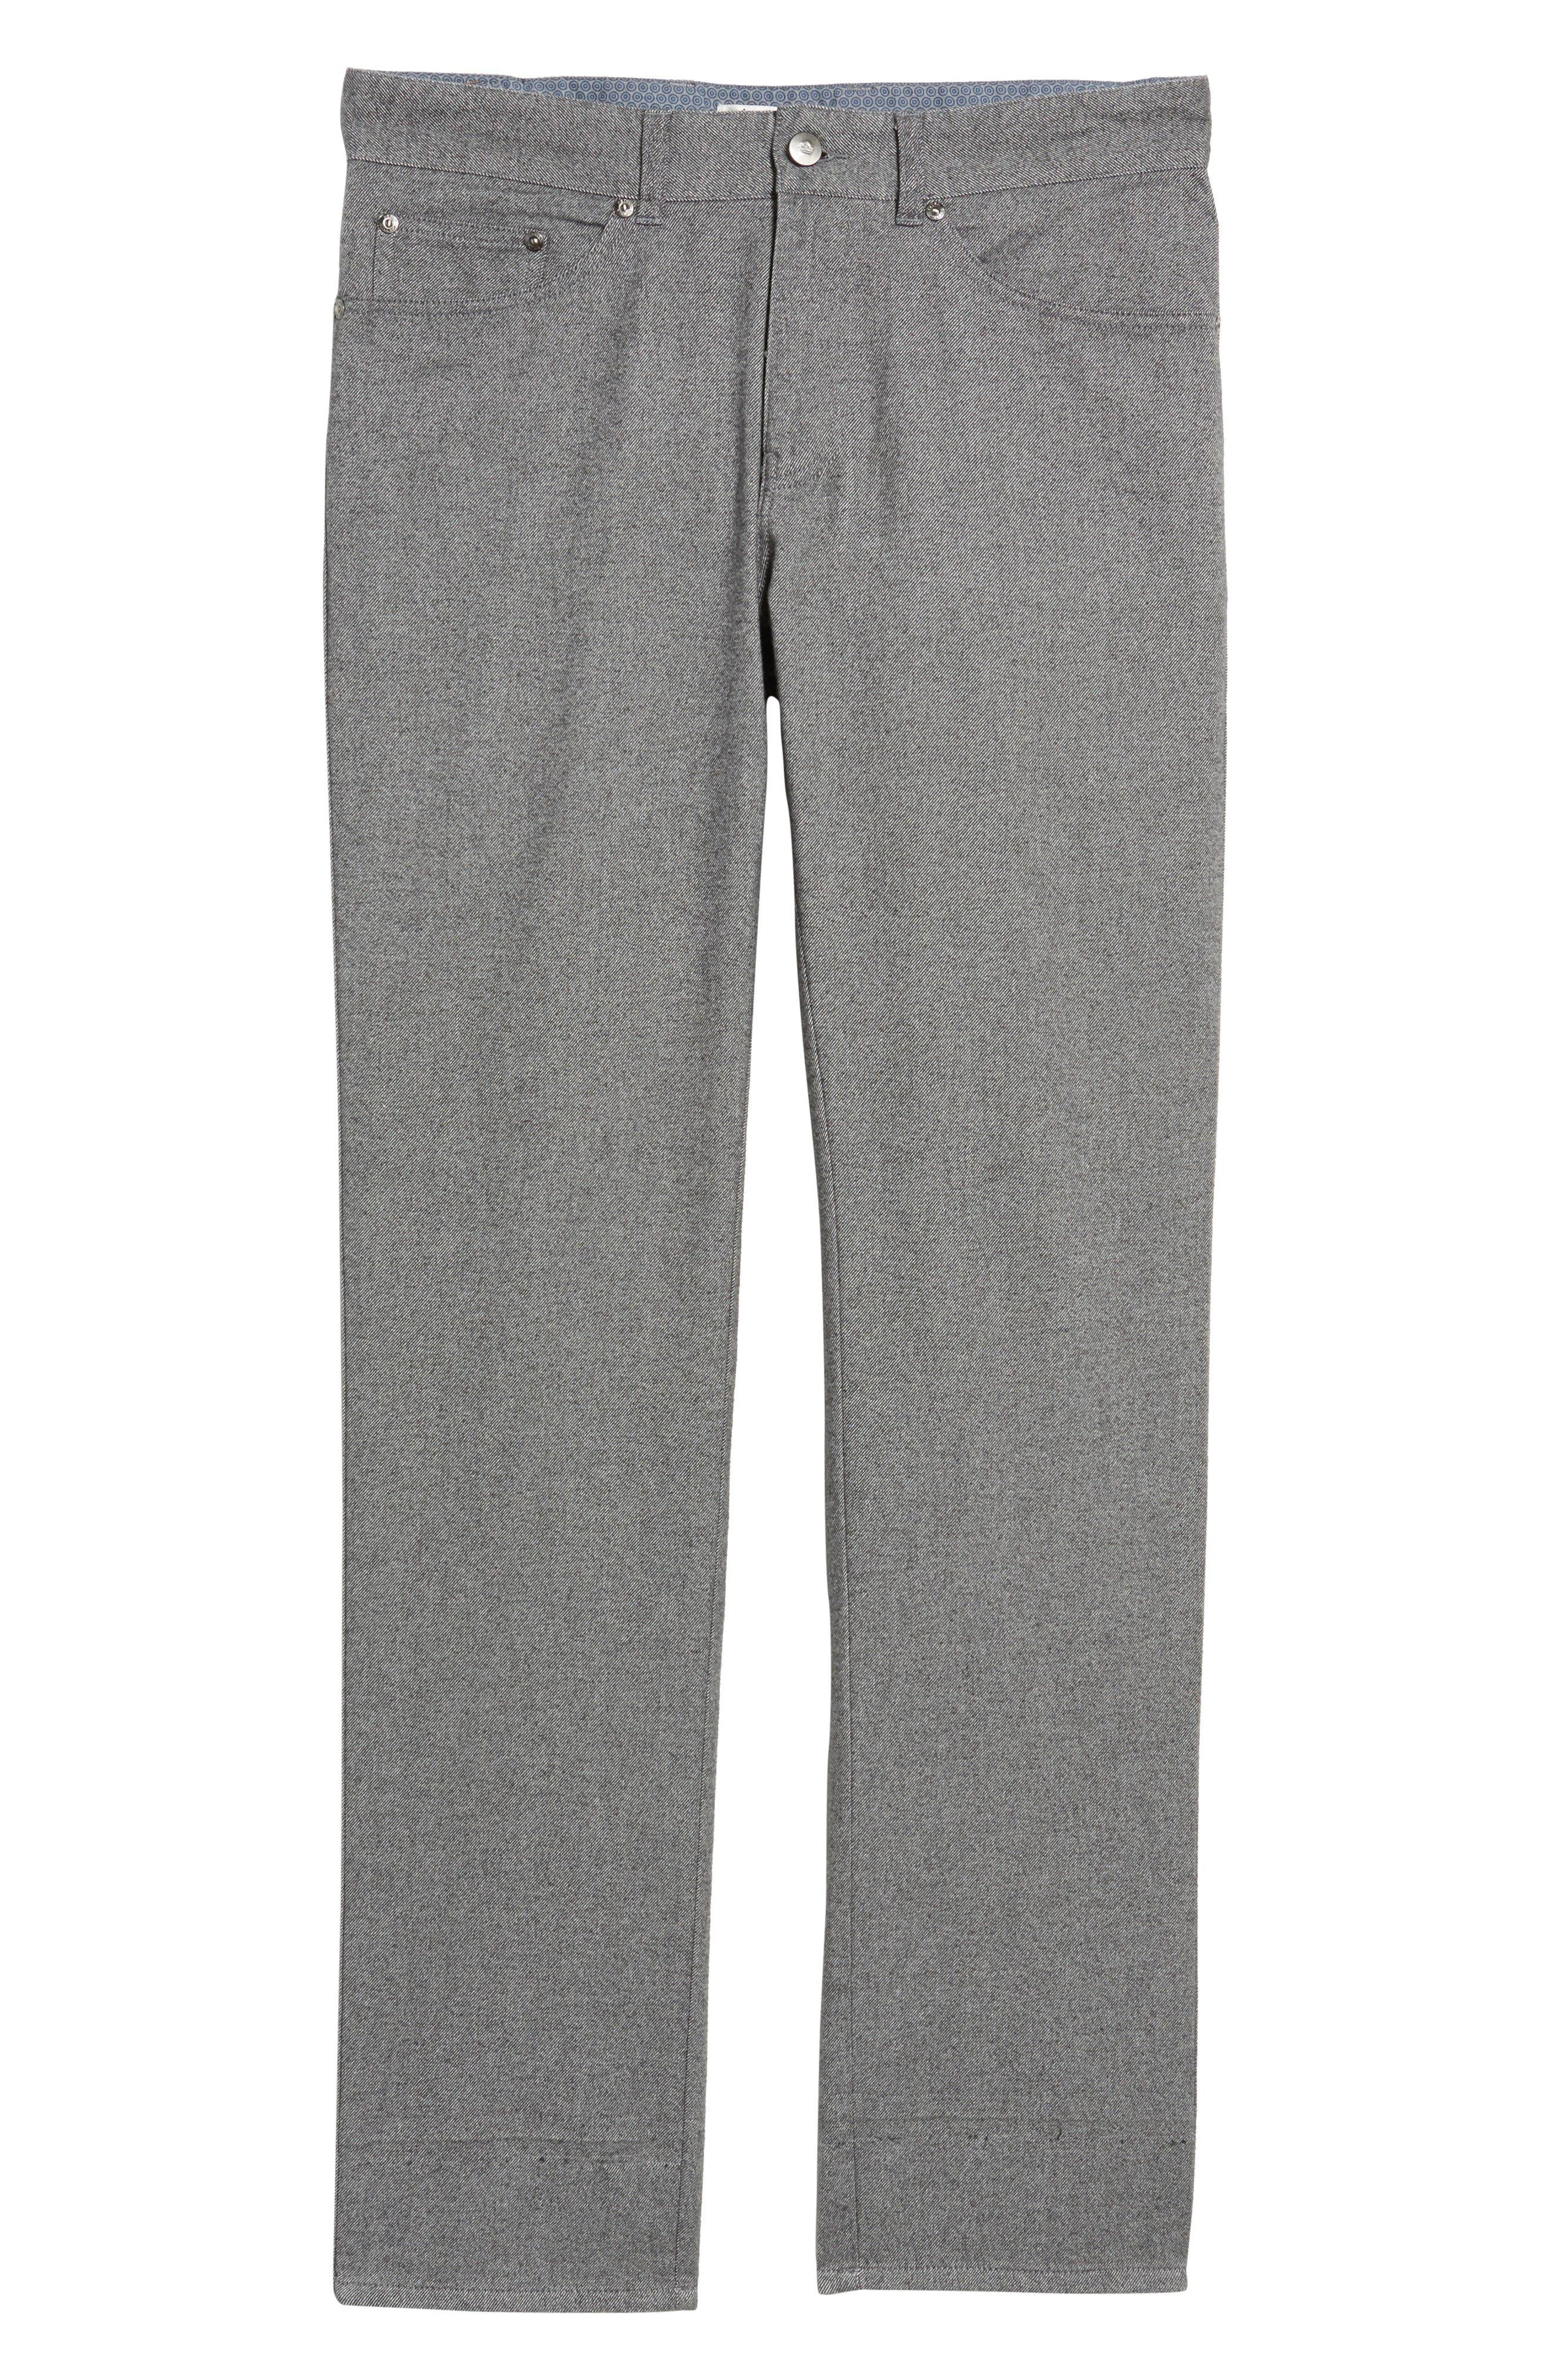 Mountainside Flannel Five-Pocket Pants,                             Alternate thumbnail 6, color,                             033